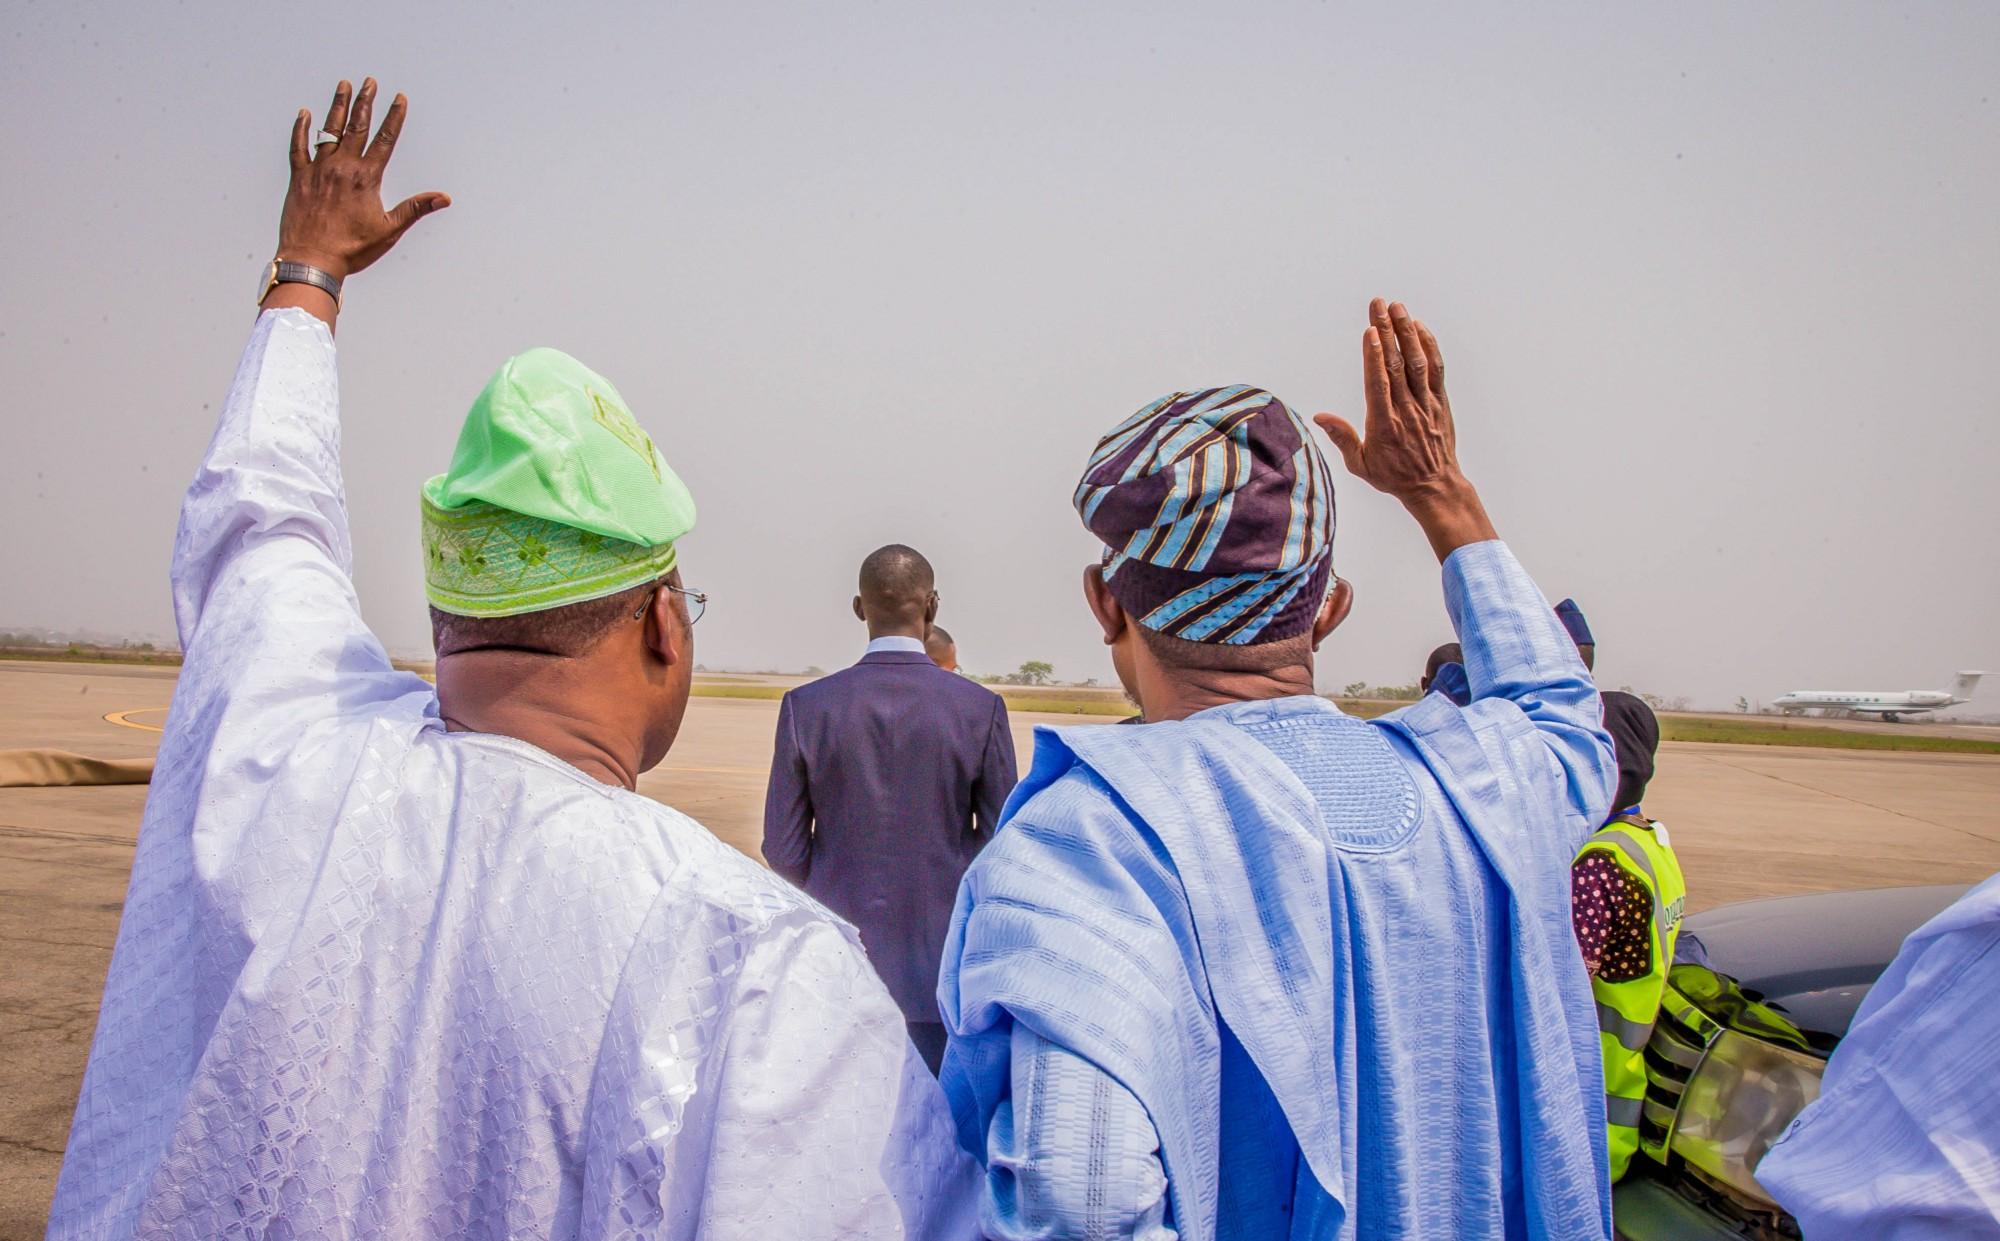 Governor Ajimobi and Governor Aregbesola wave good-bye as Vice- President Yemi Osinbajo's plane takes off from Ibadan. (Photo by: Tolani Alli)